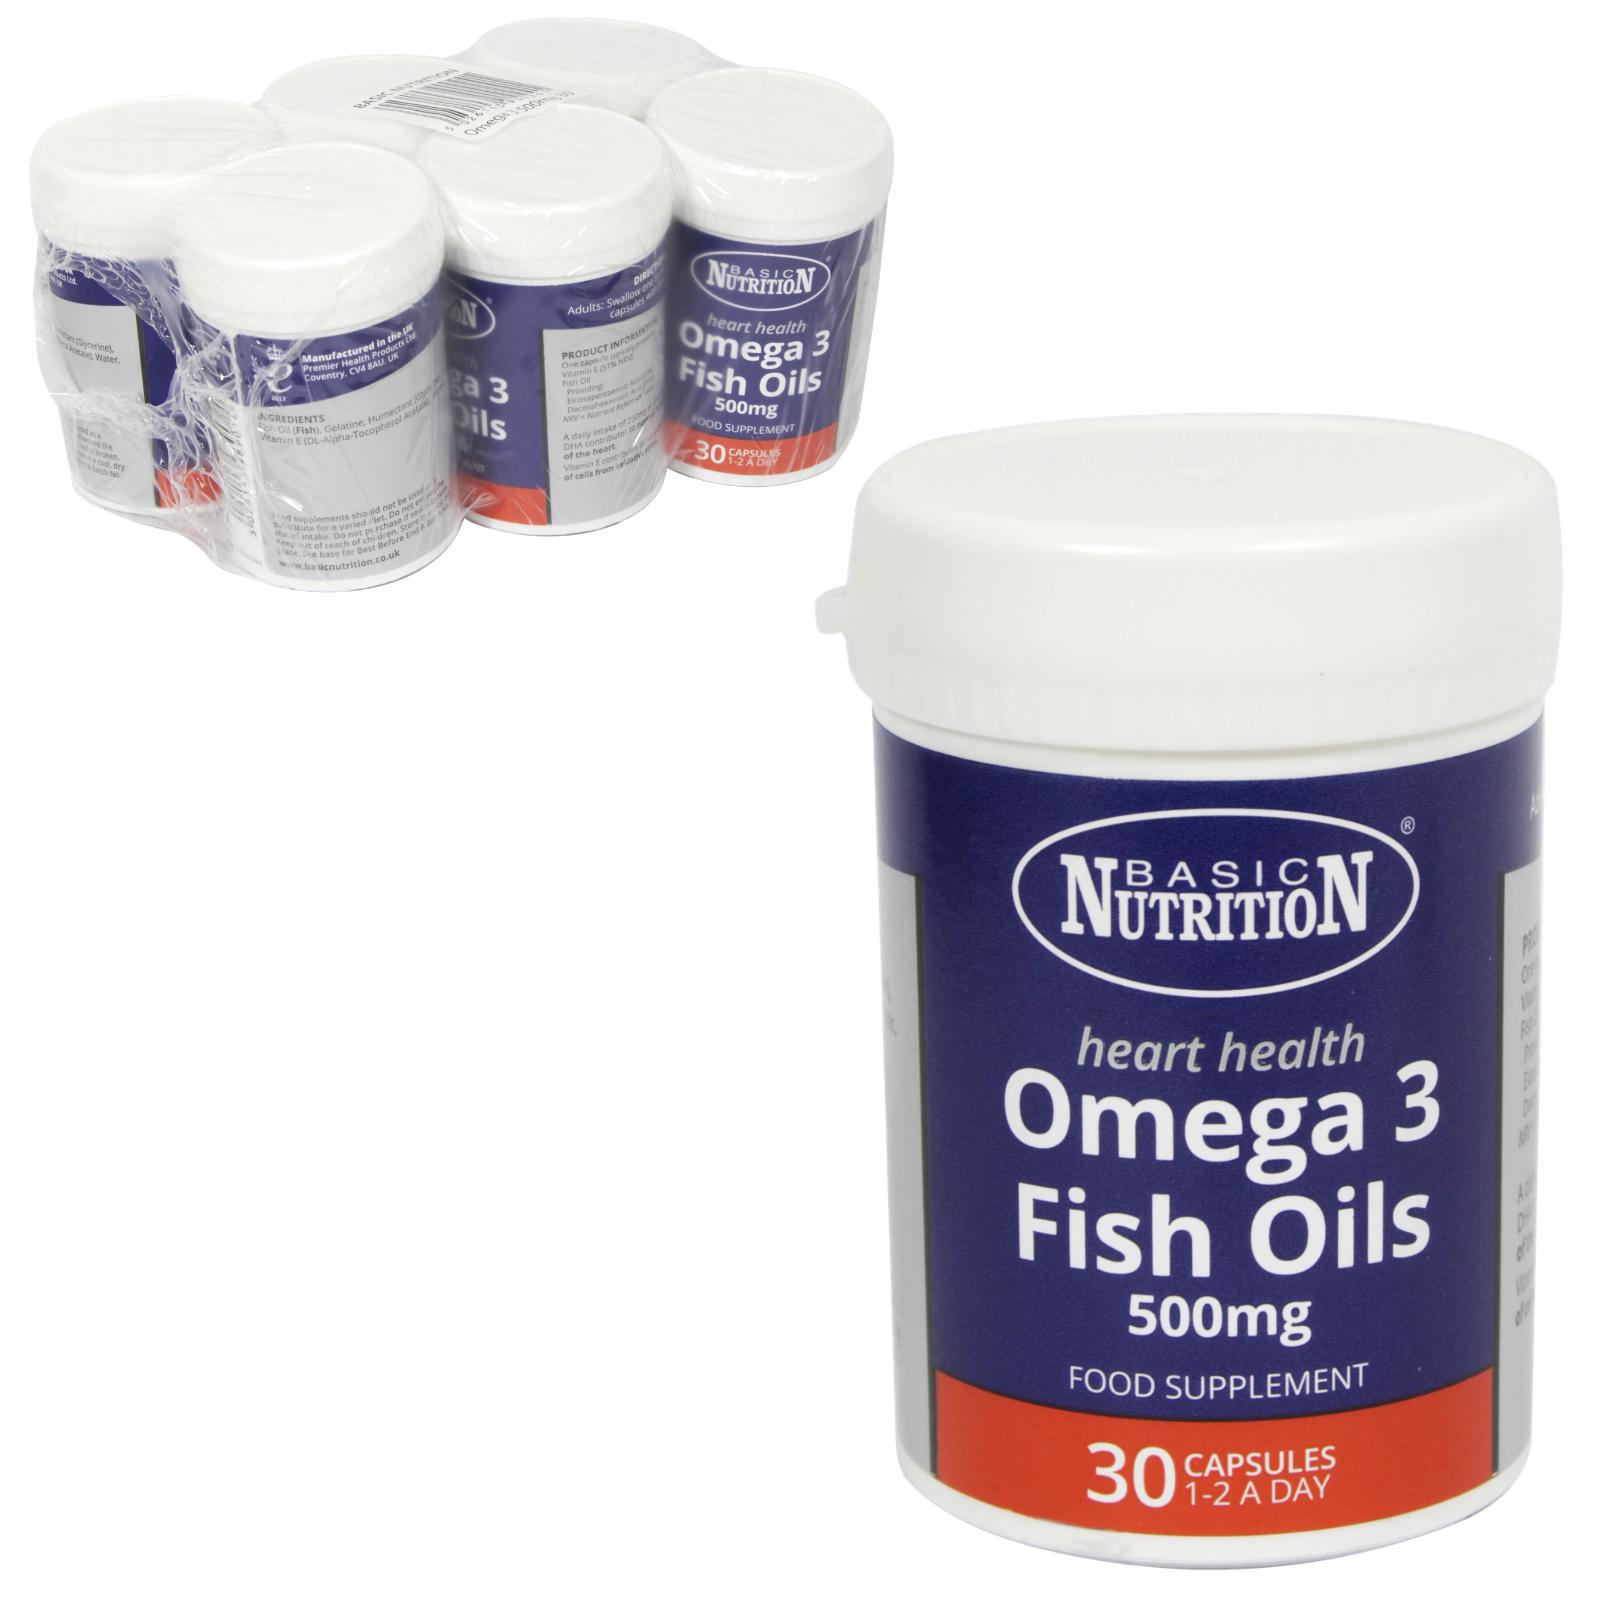 BASIC NUTRITION OMEGA-3 30X500MG X6